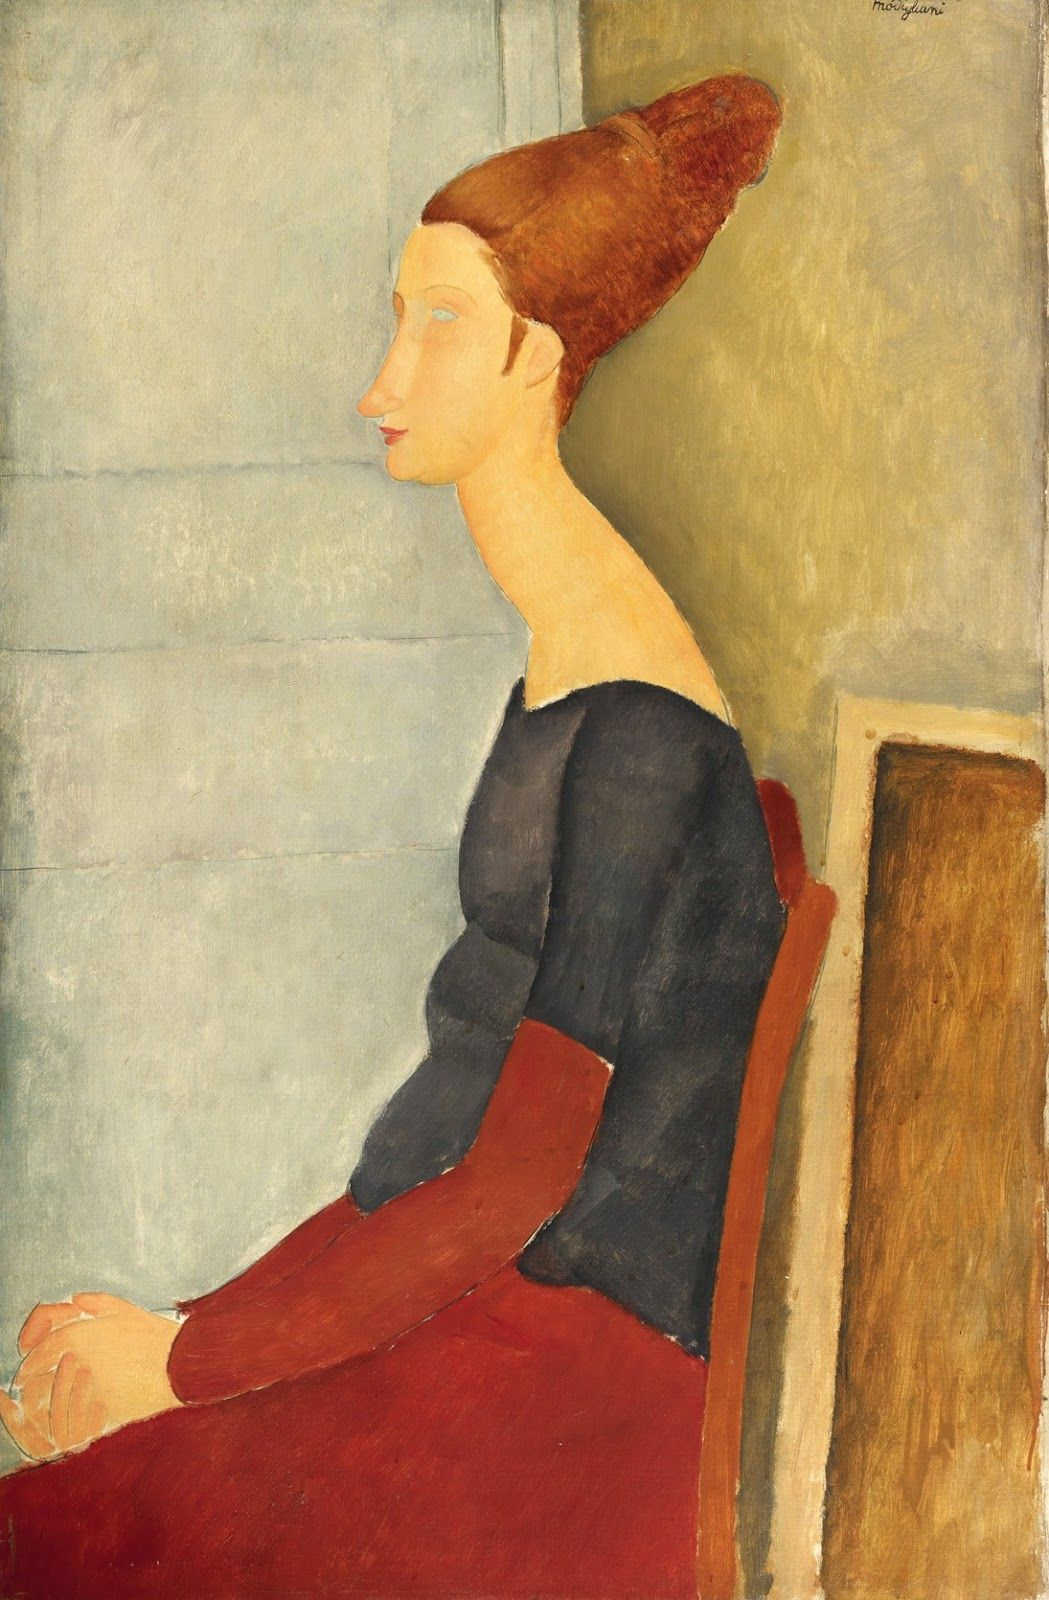 Amedeo Modigliani | Quotes / Aforismi | Modigliani, Amedeo modigliani,  Modigliani paintings